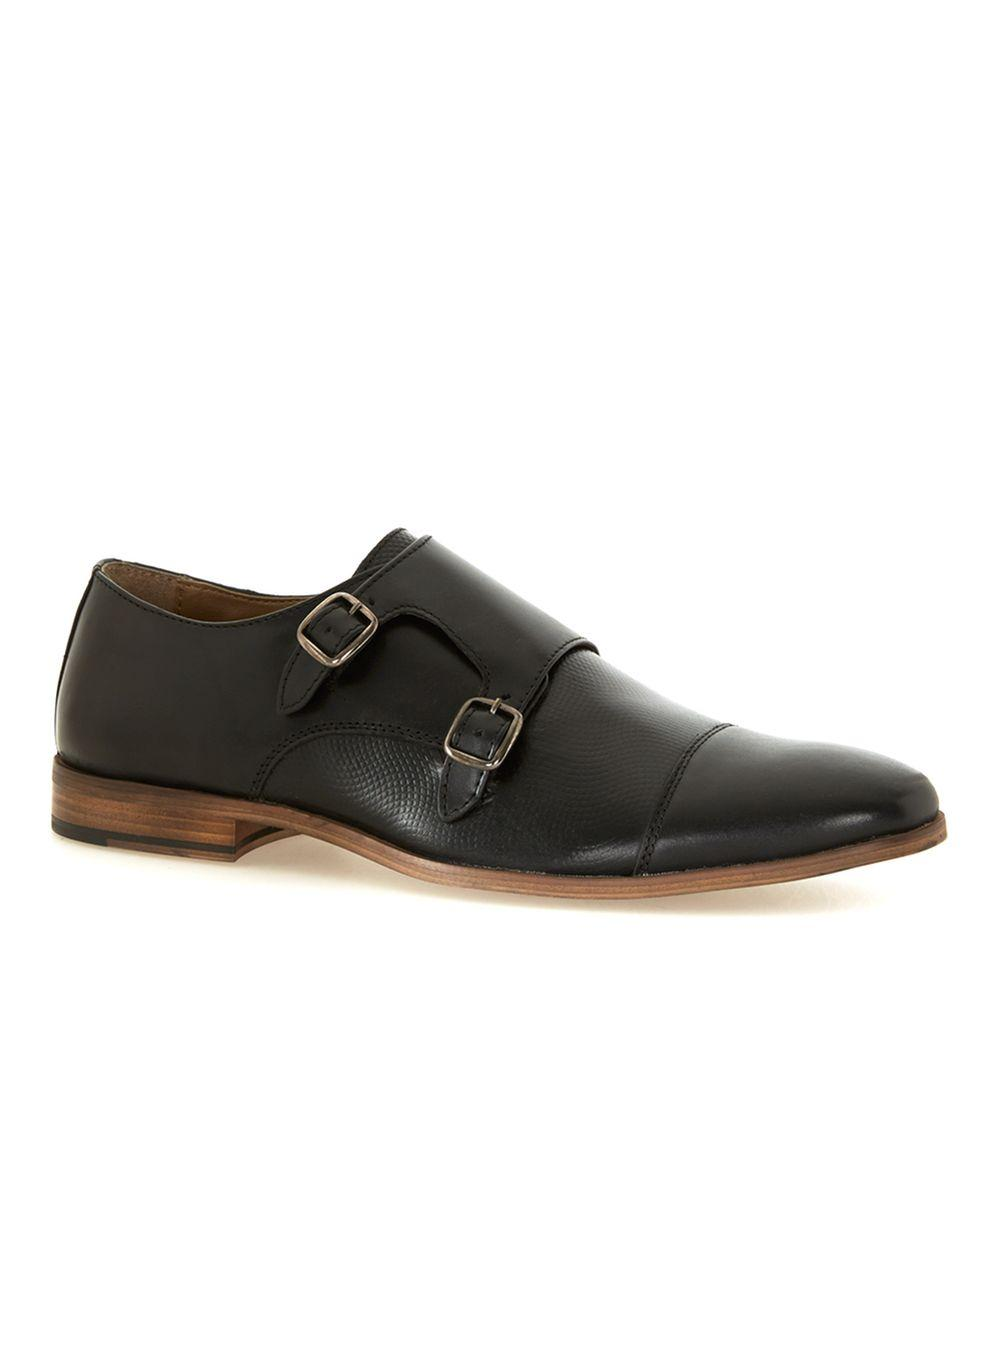 Topman Shoes Australia